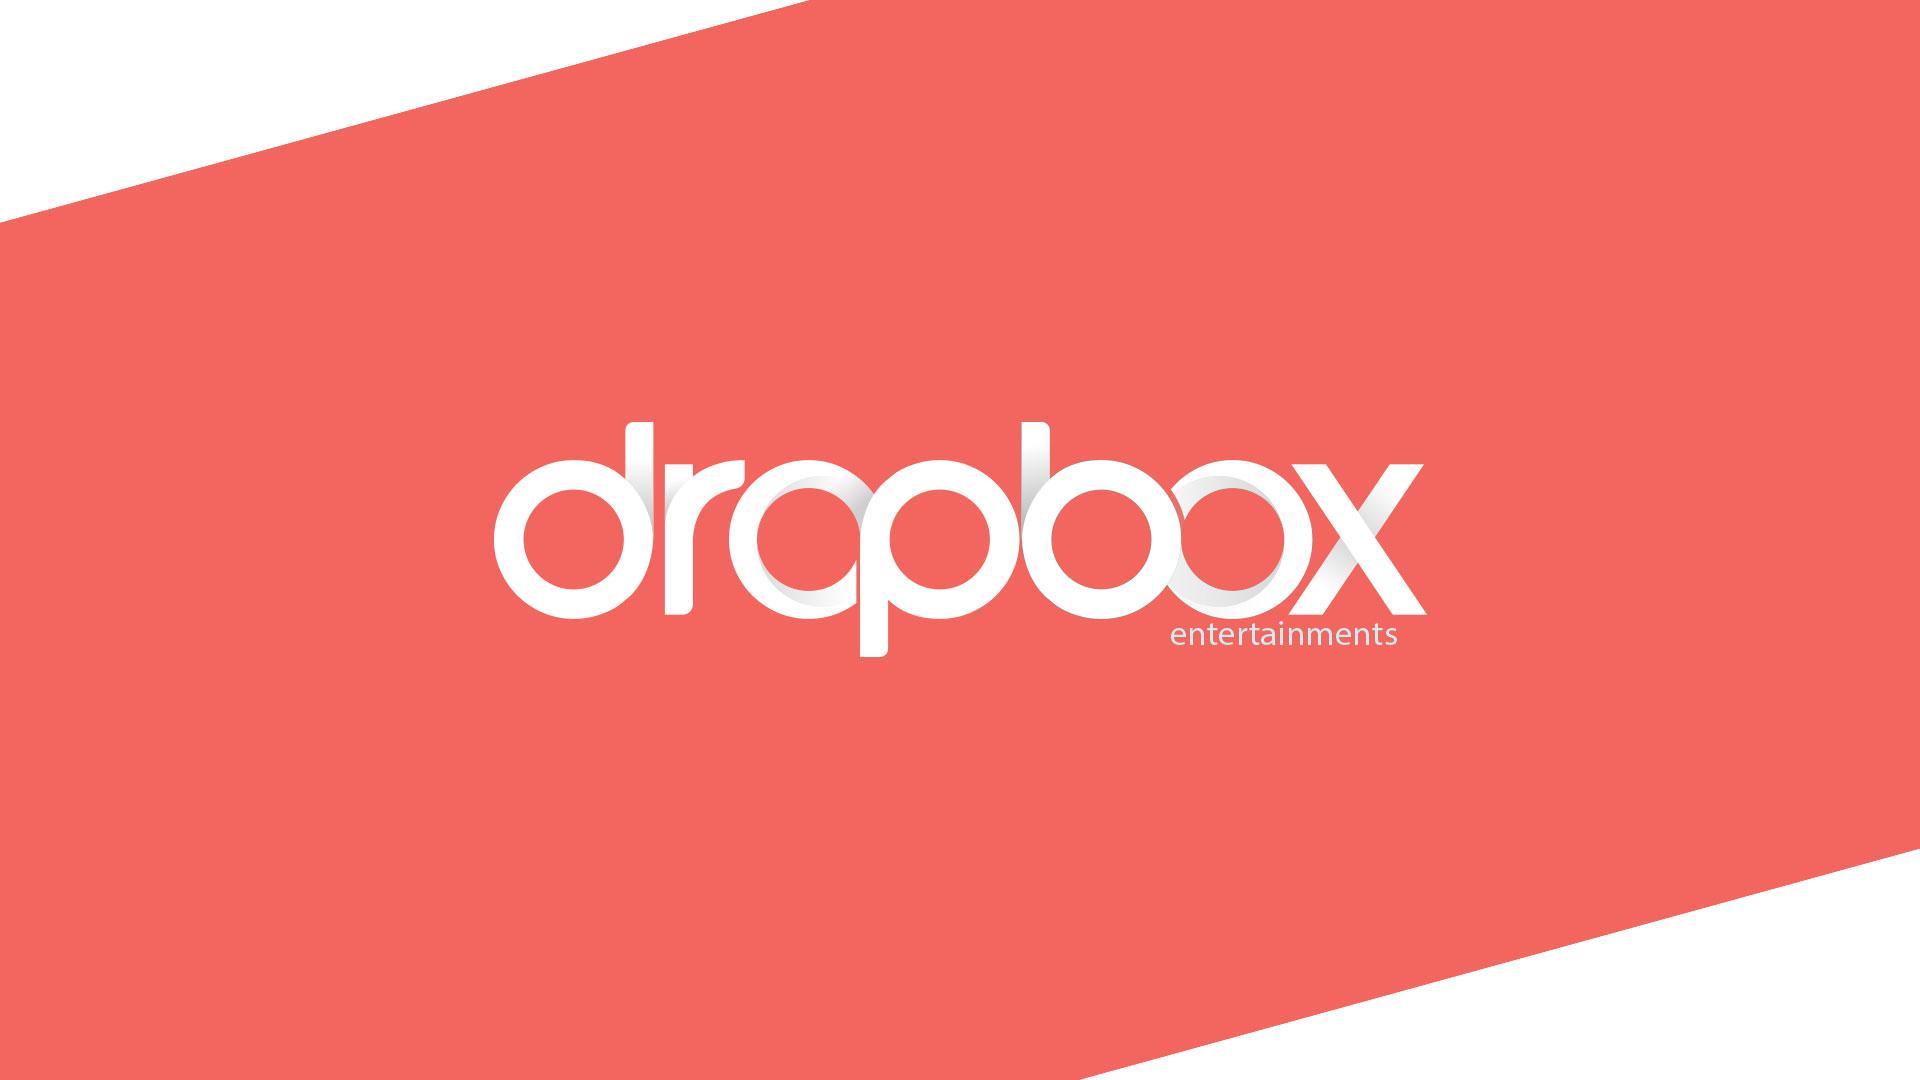 Dropbox Entertainments Logo Design by ZeroBulb Company